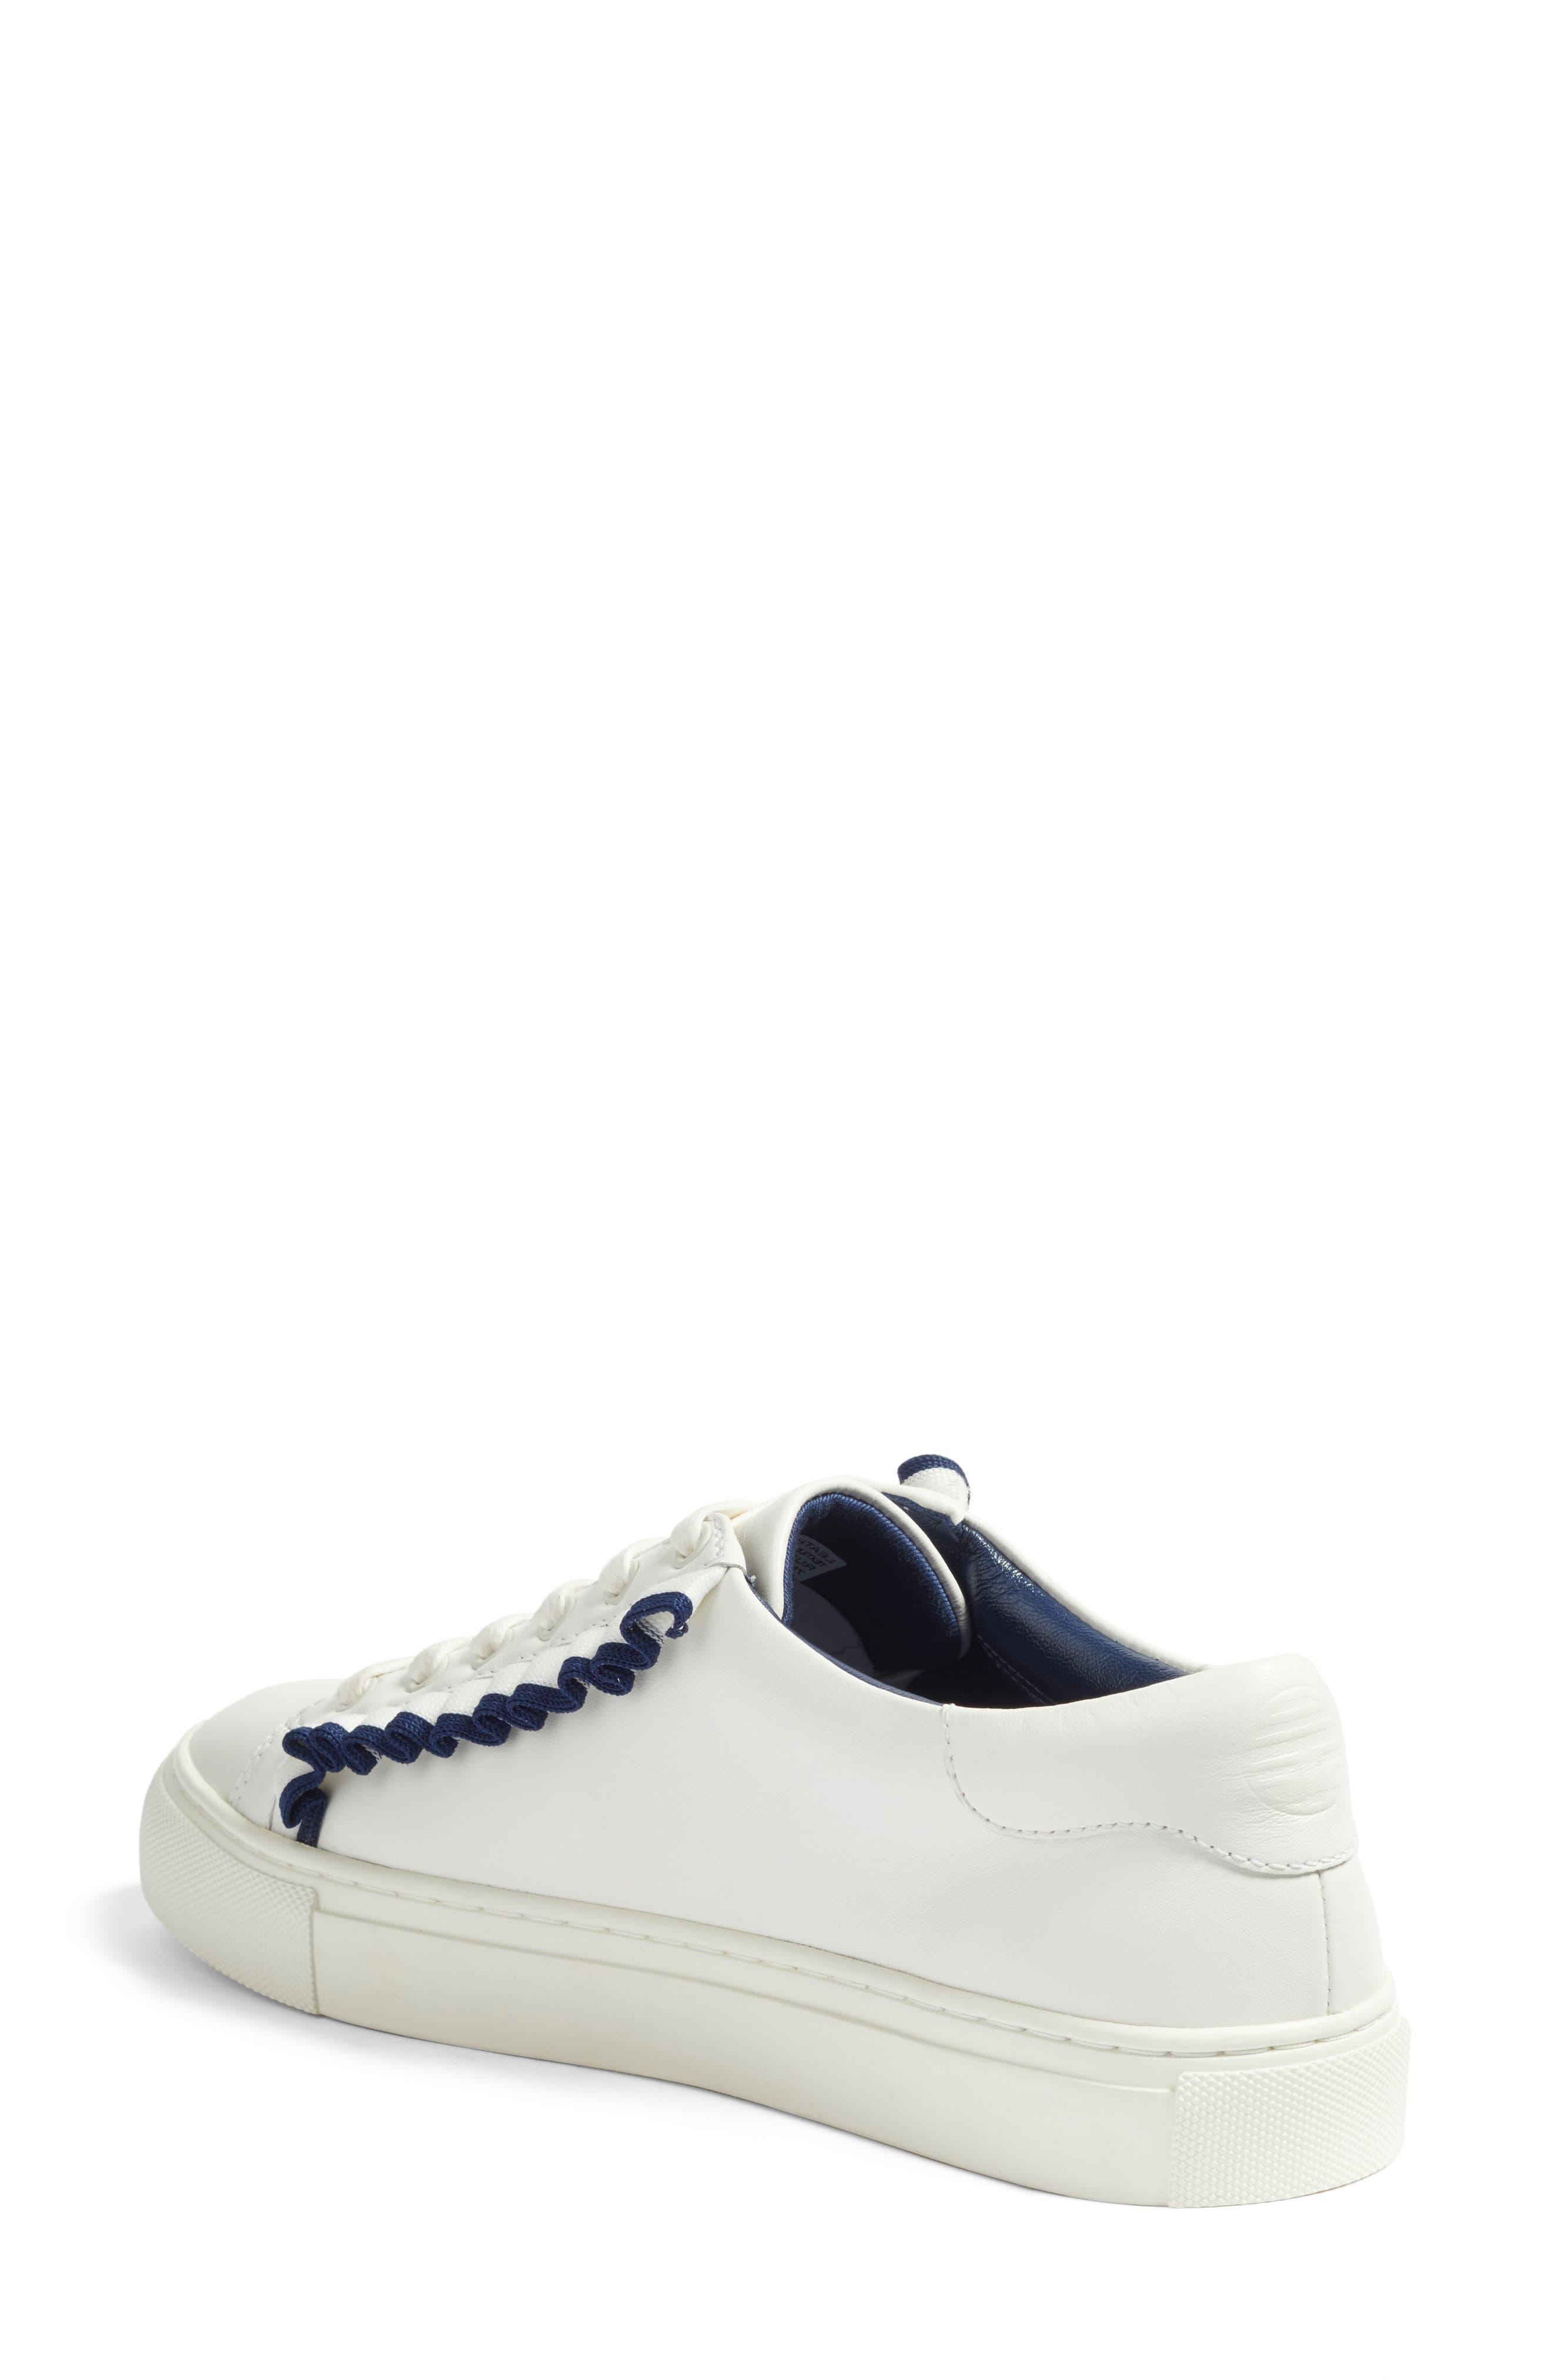 Ruffle Sneaker,                             Alternate thumbnail 2, color,                             Snow White/ Navy Sea